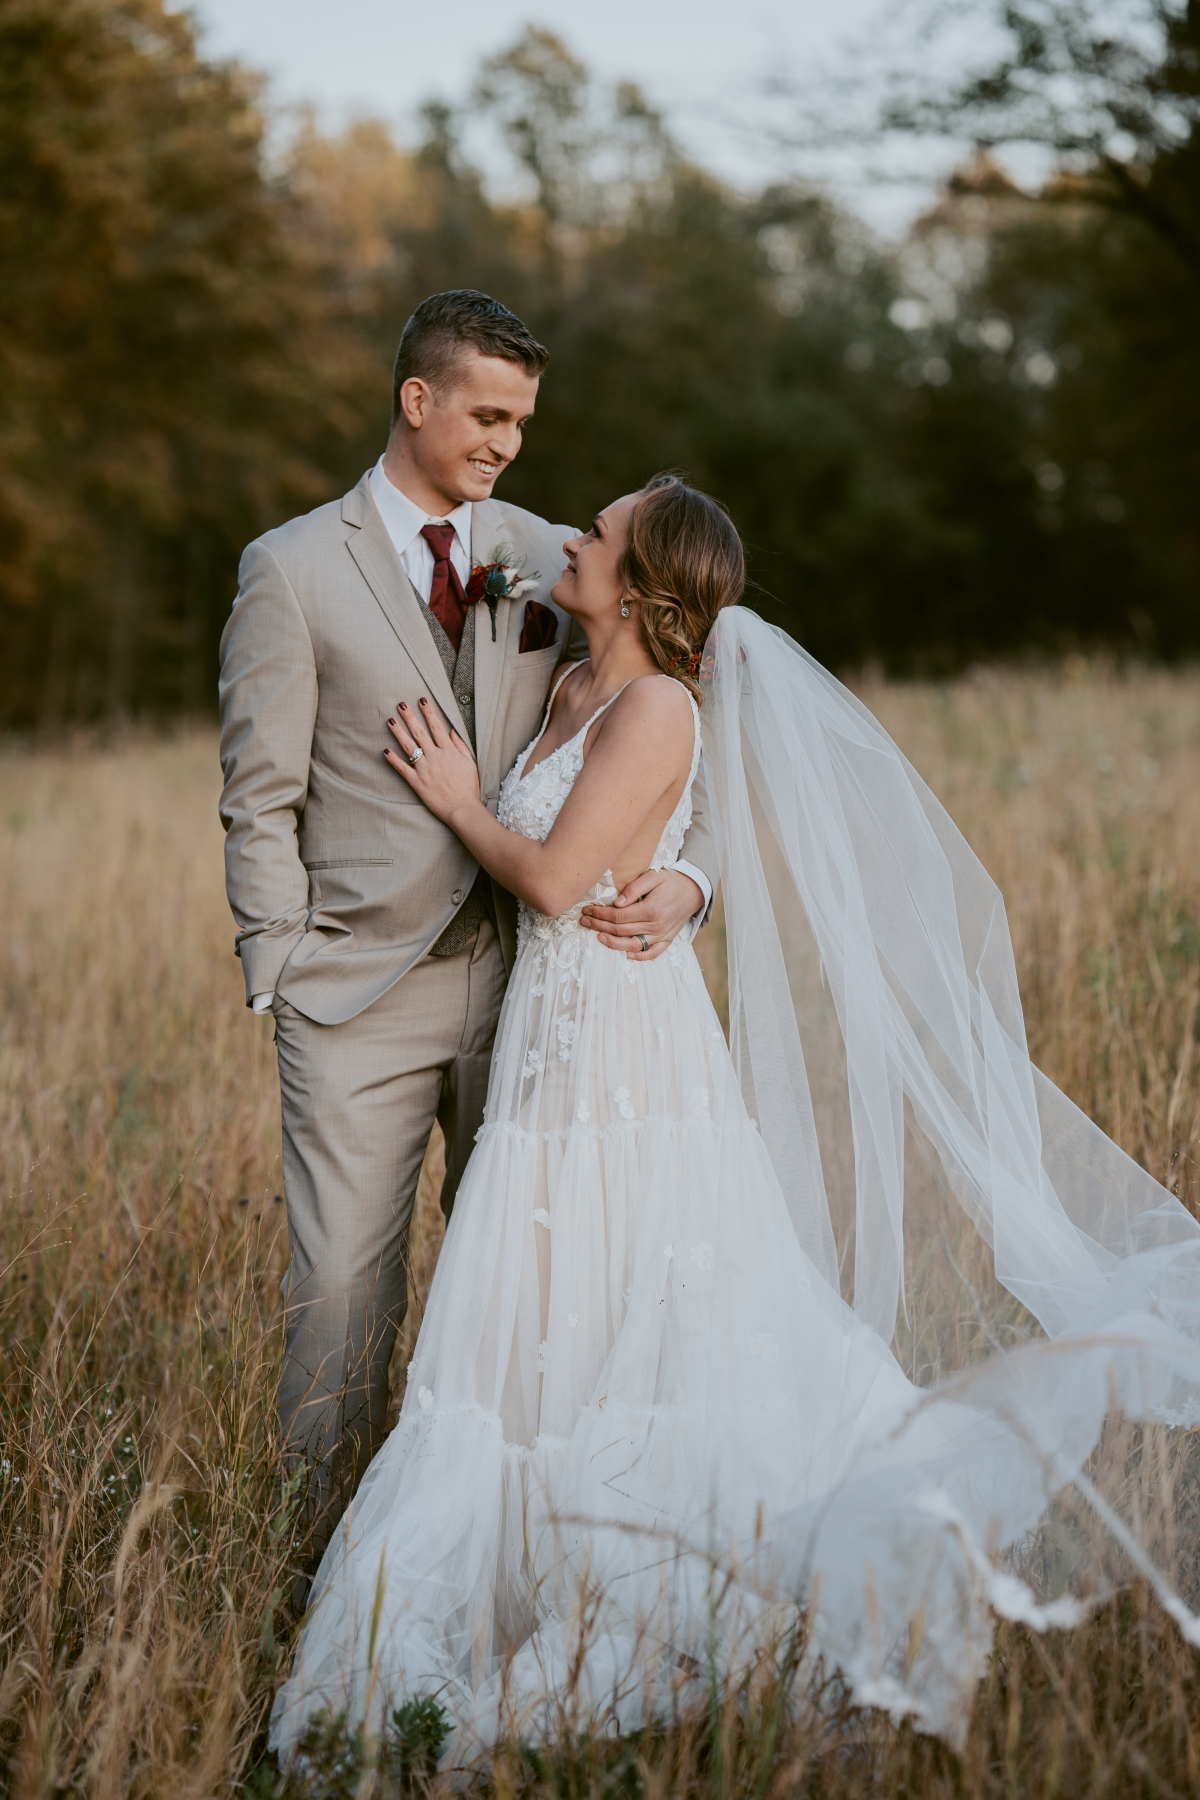 Millennium Moments Chicago Wedding Photographer 81